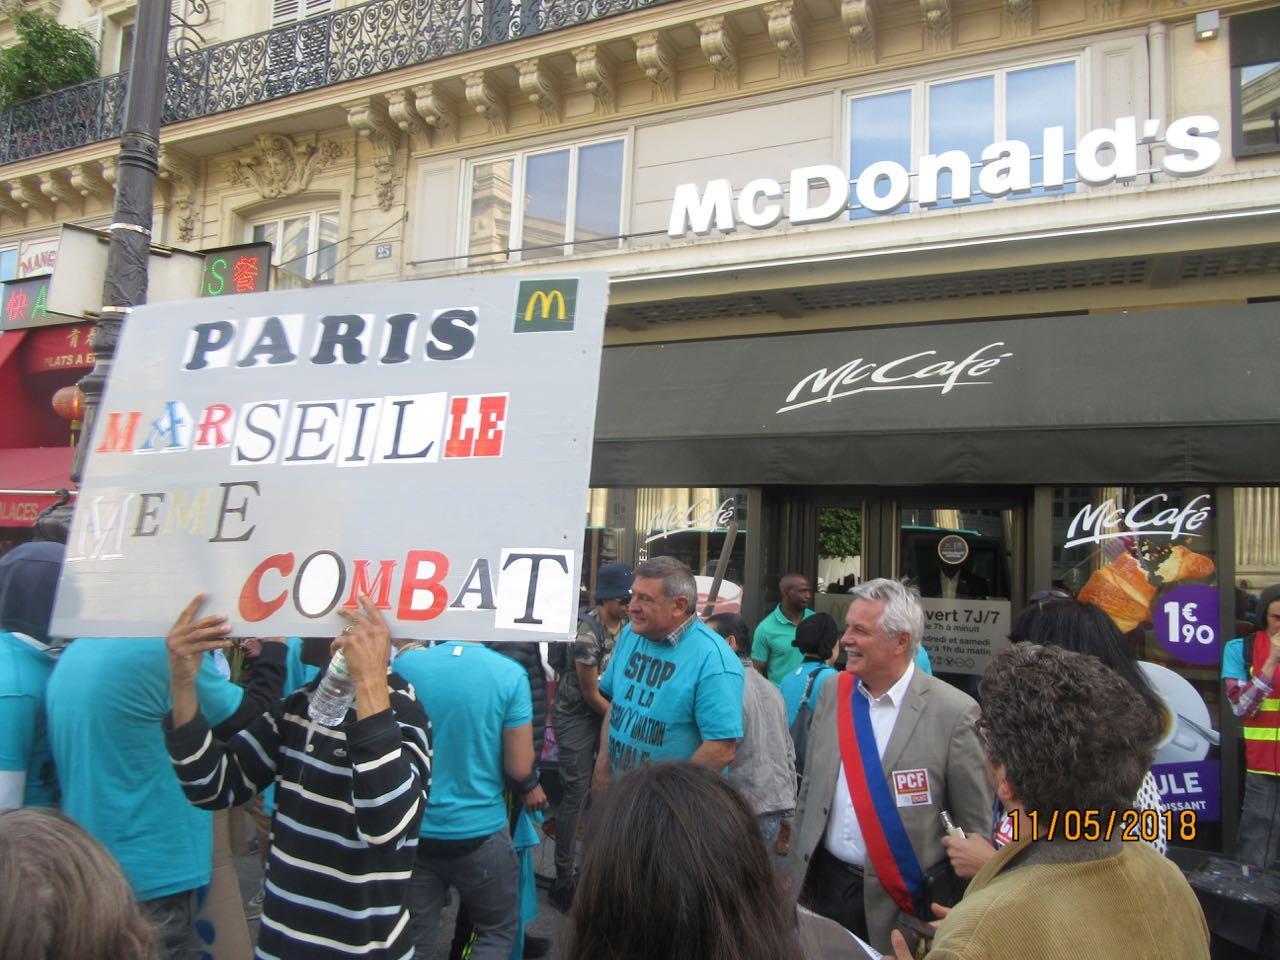 Rassemblement devant McDonald's de la gare du Nord 12 mai 2018 . img_7411.jpg